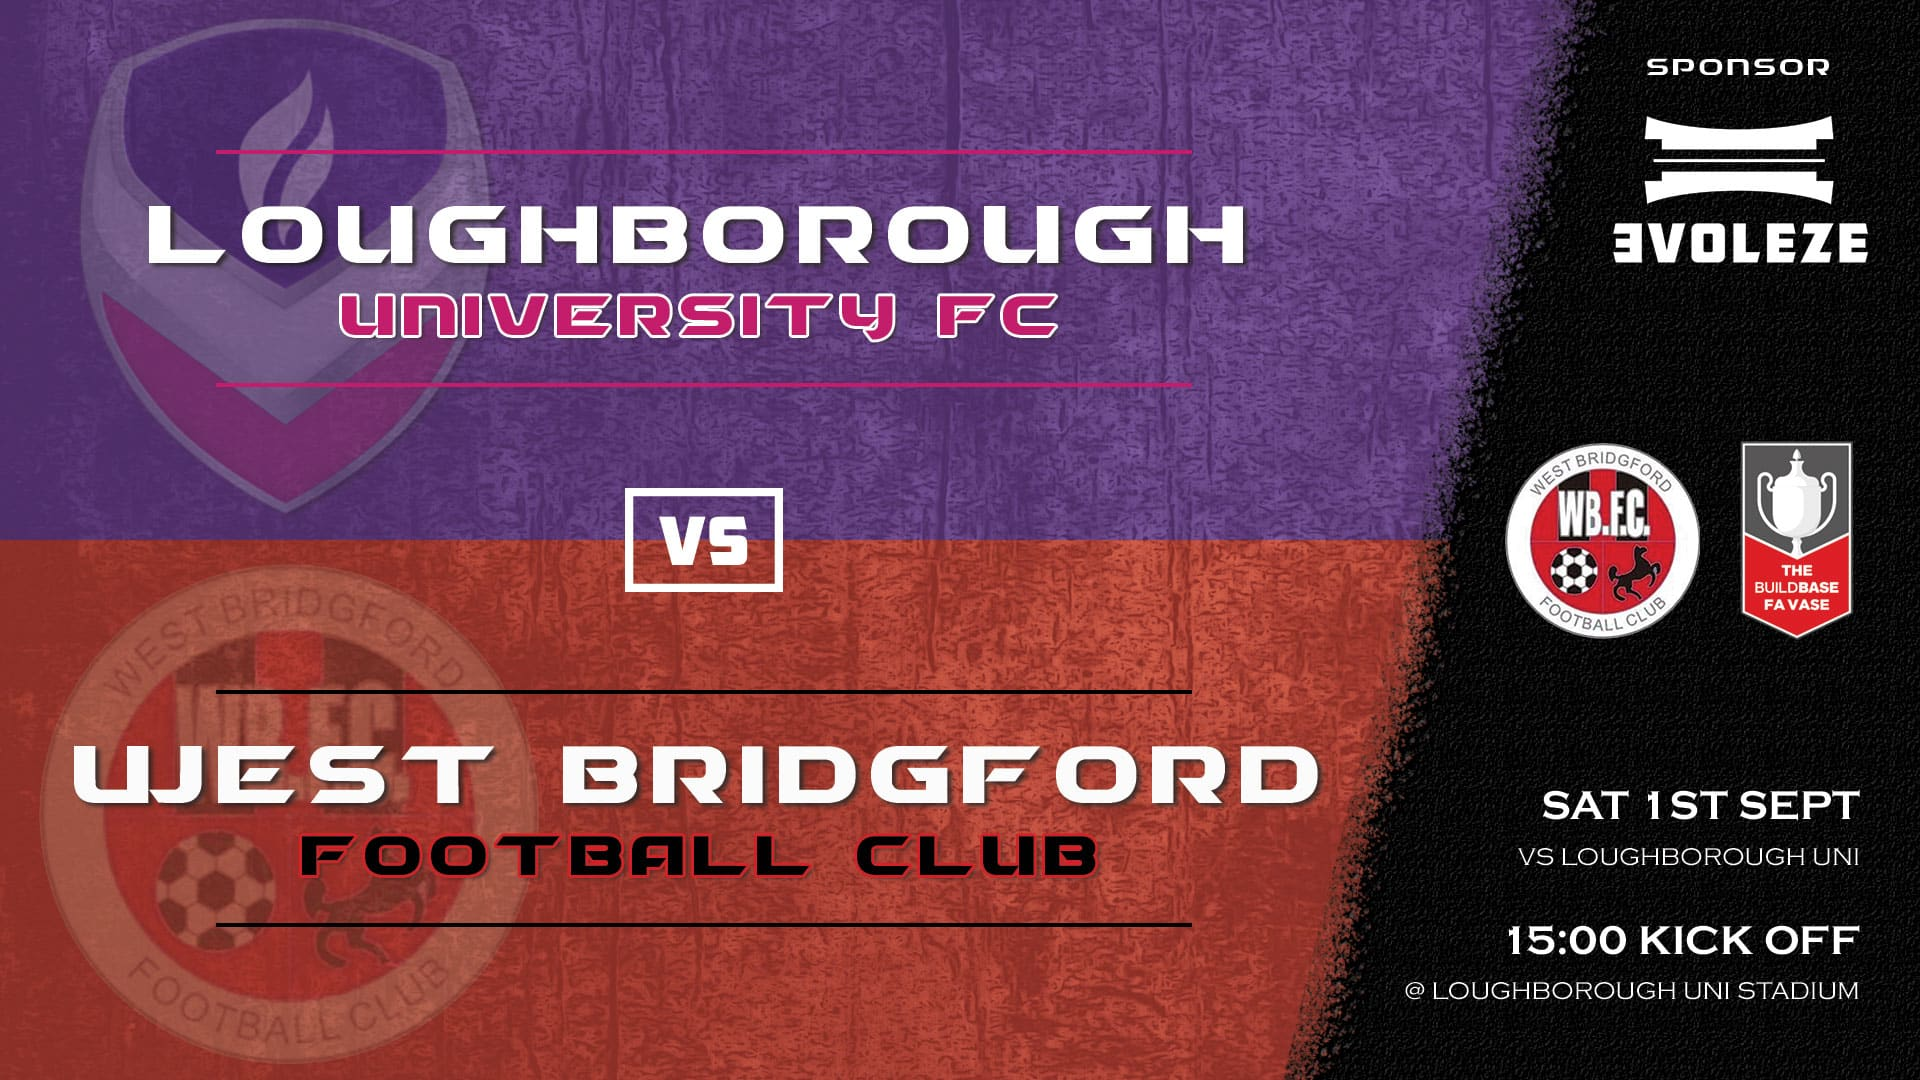 fixture - West Bridgford FC